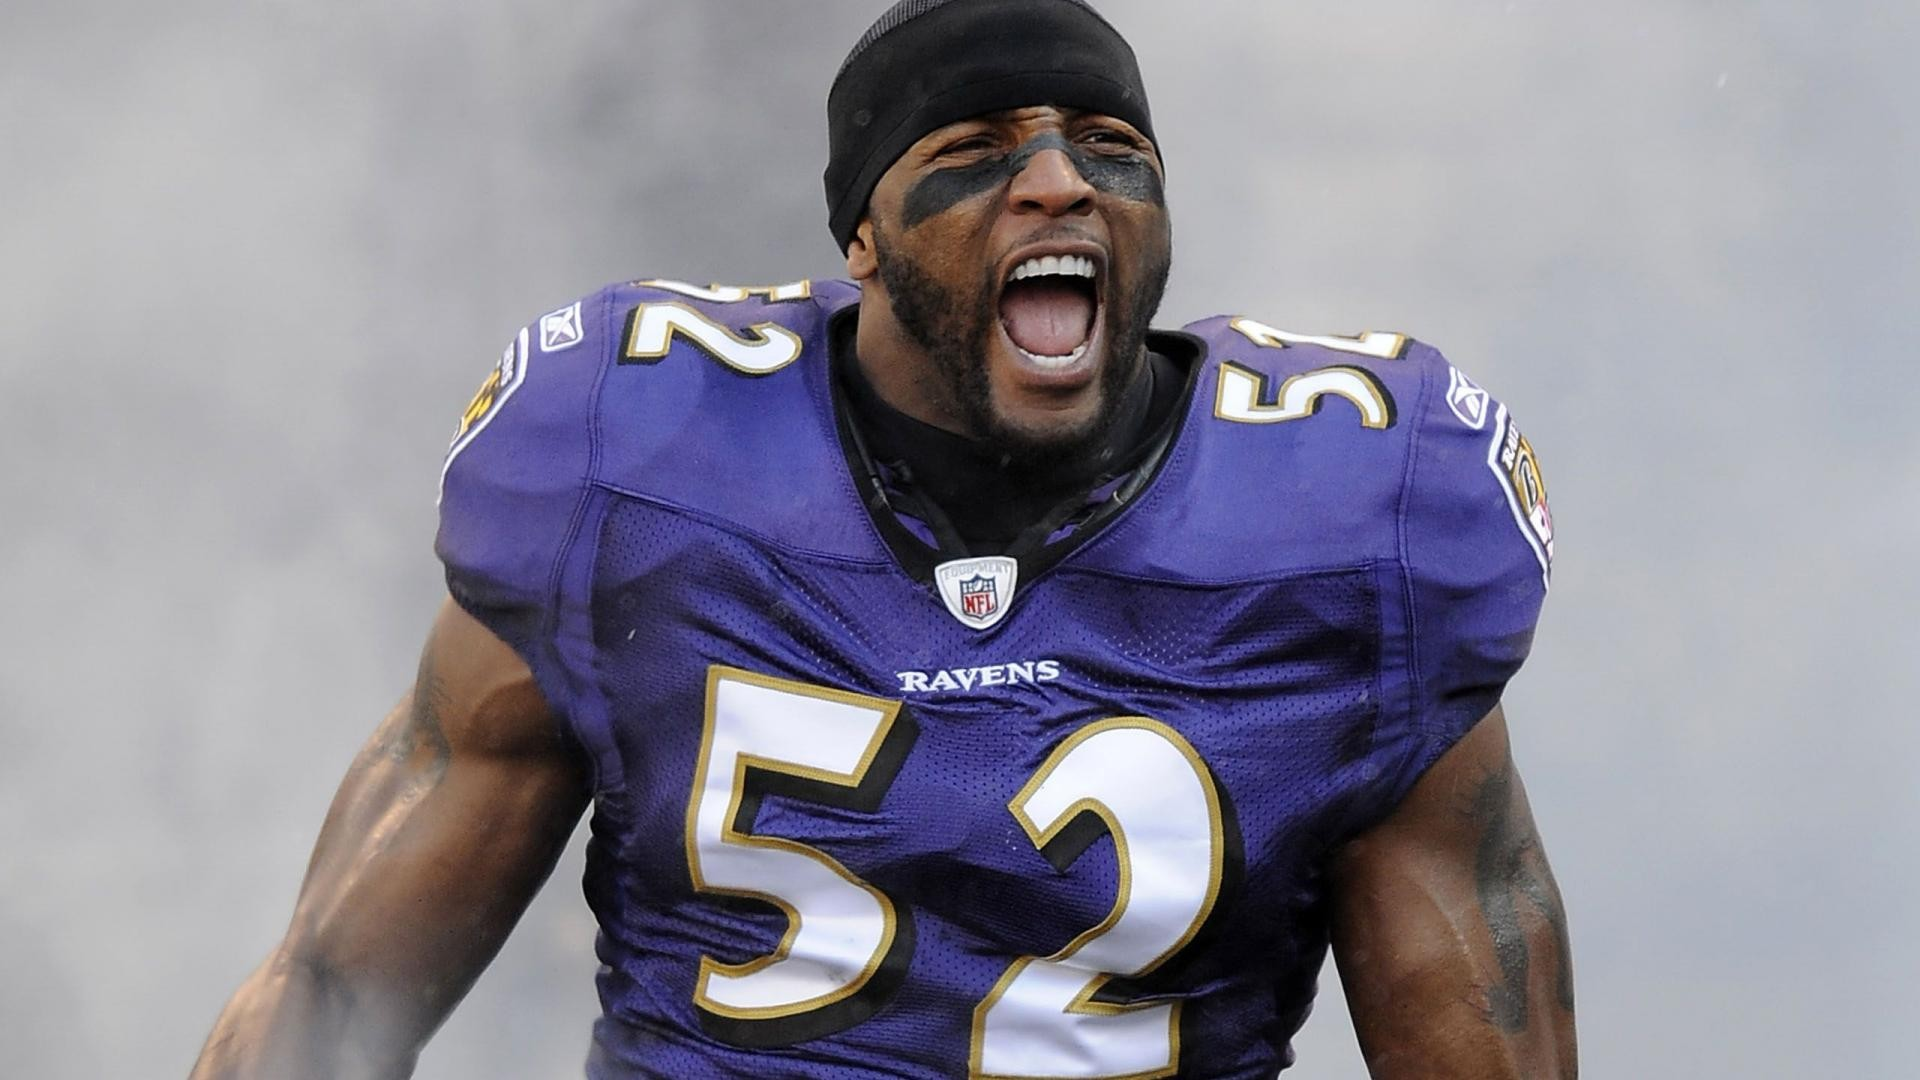 Ray Lewis 2013 Baltimore Ravens HD    Football HD Wallpaper